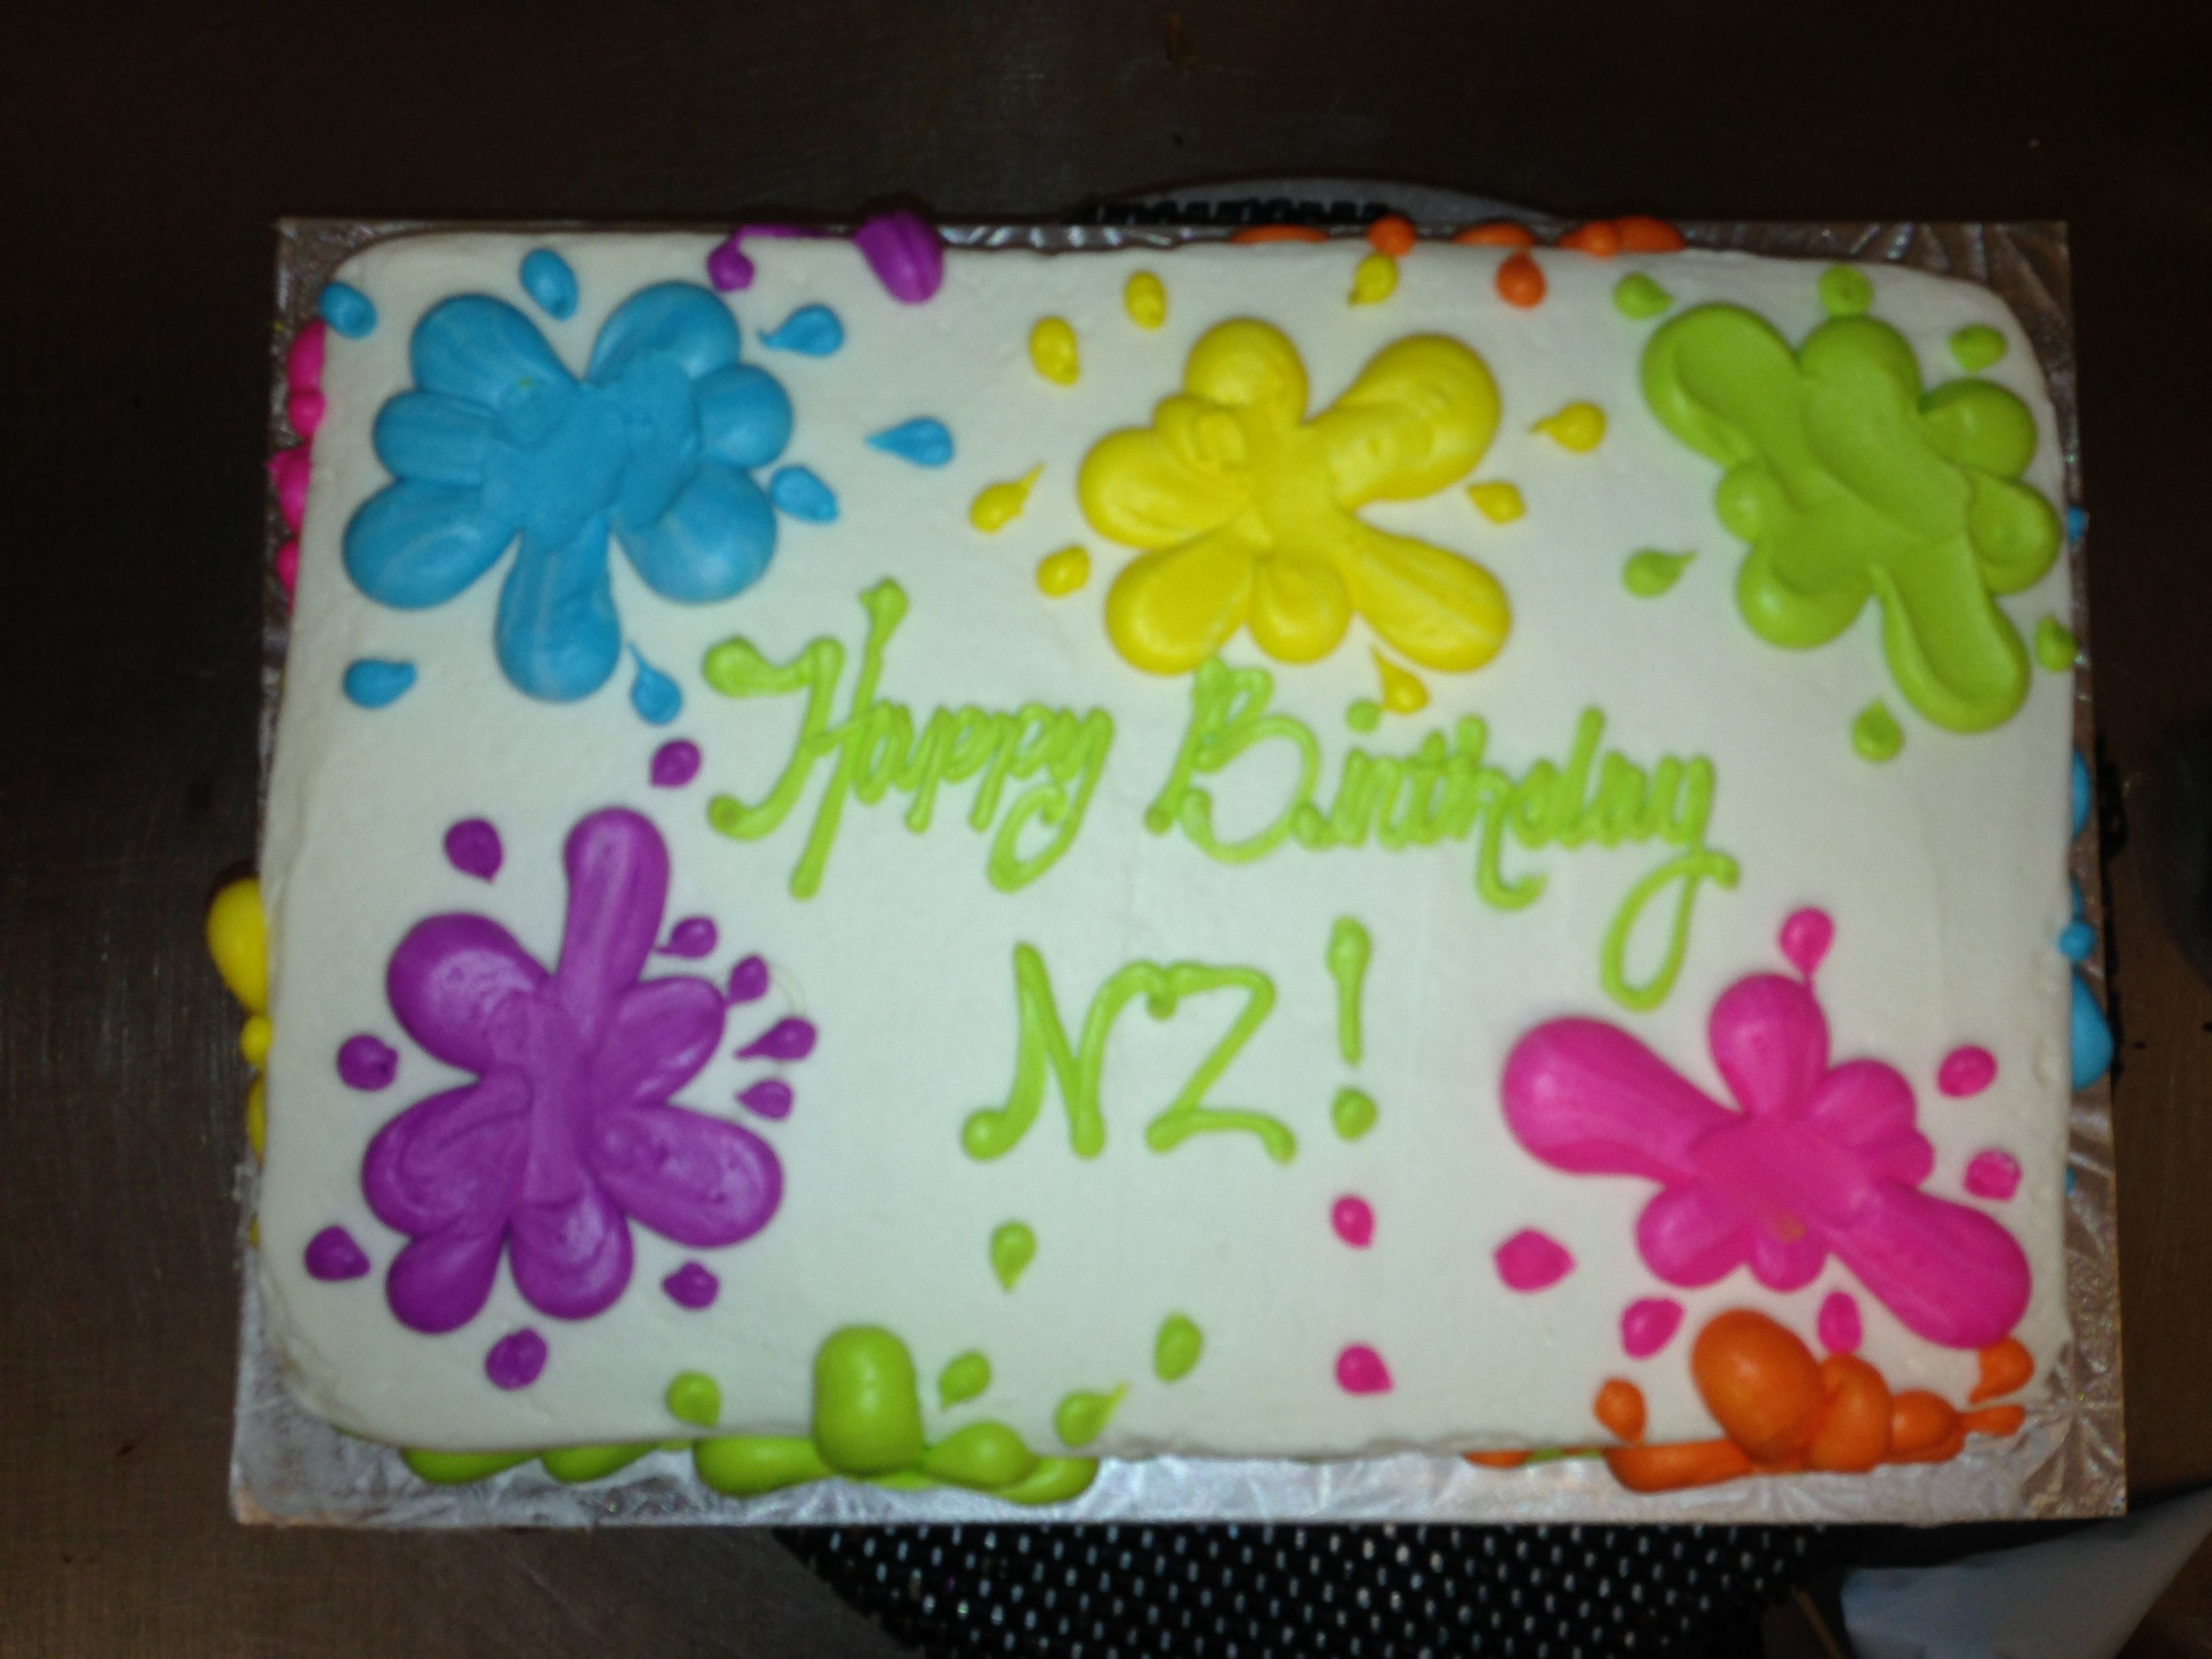 Paint Splatter Cake Decorating